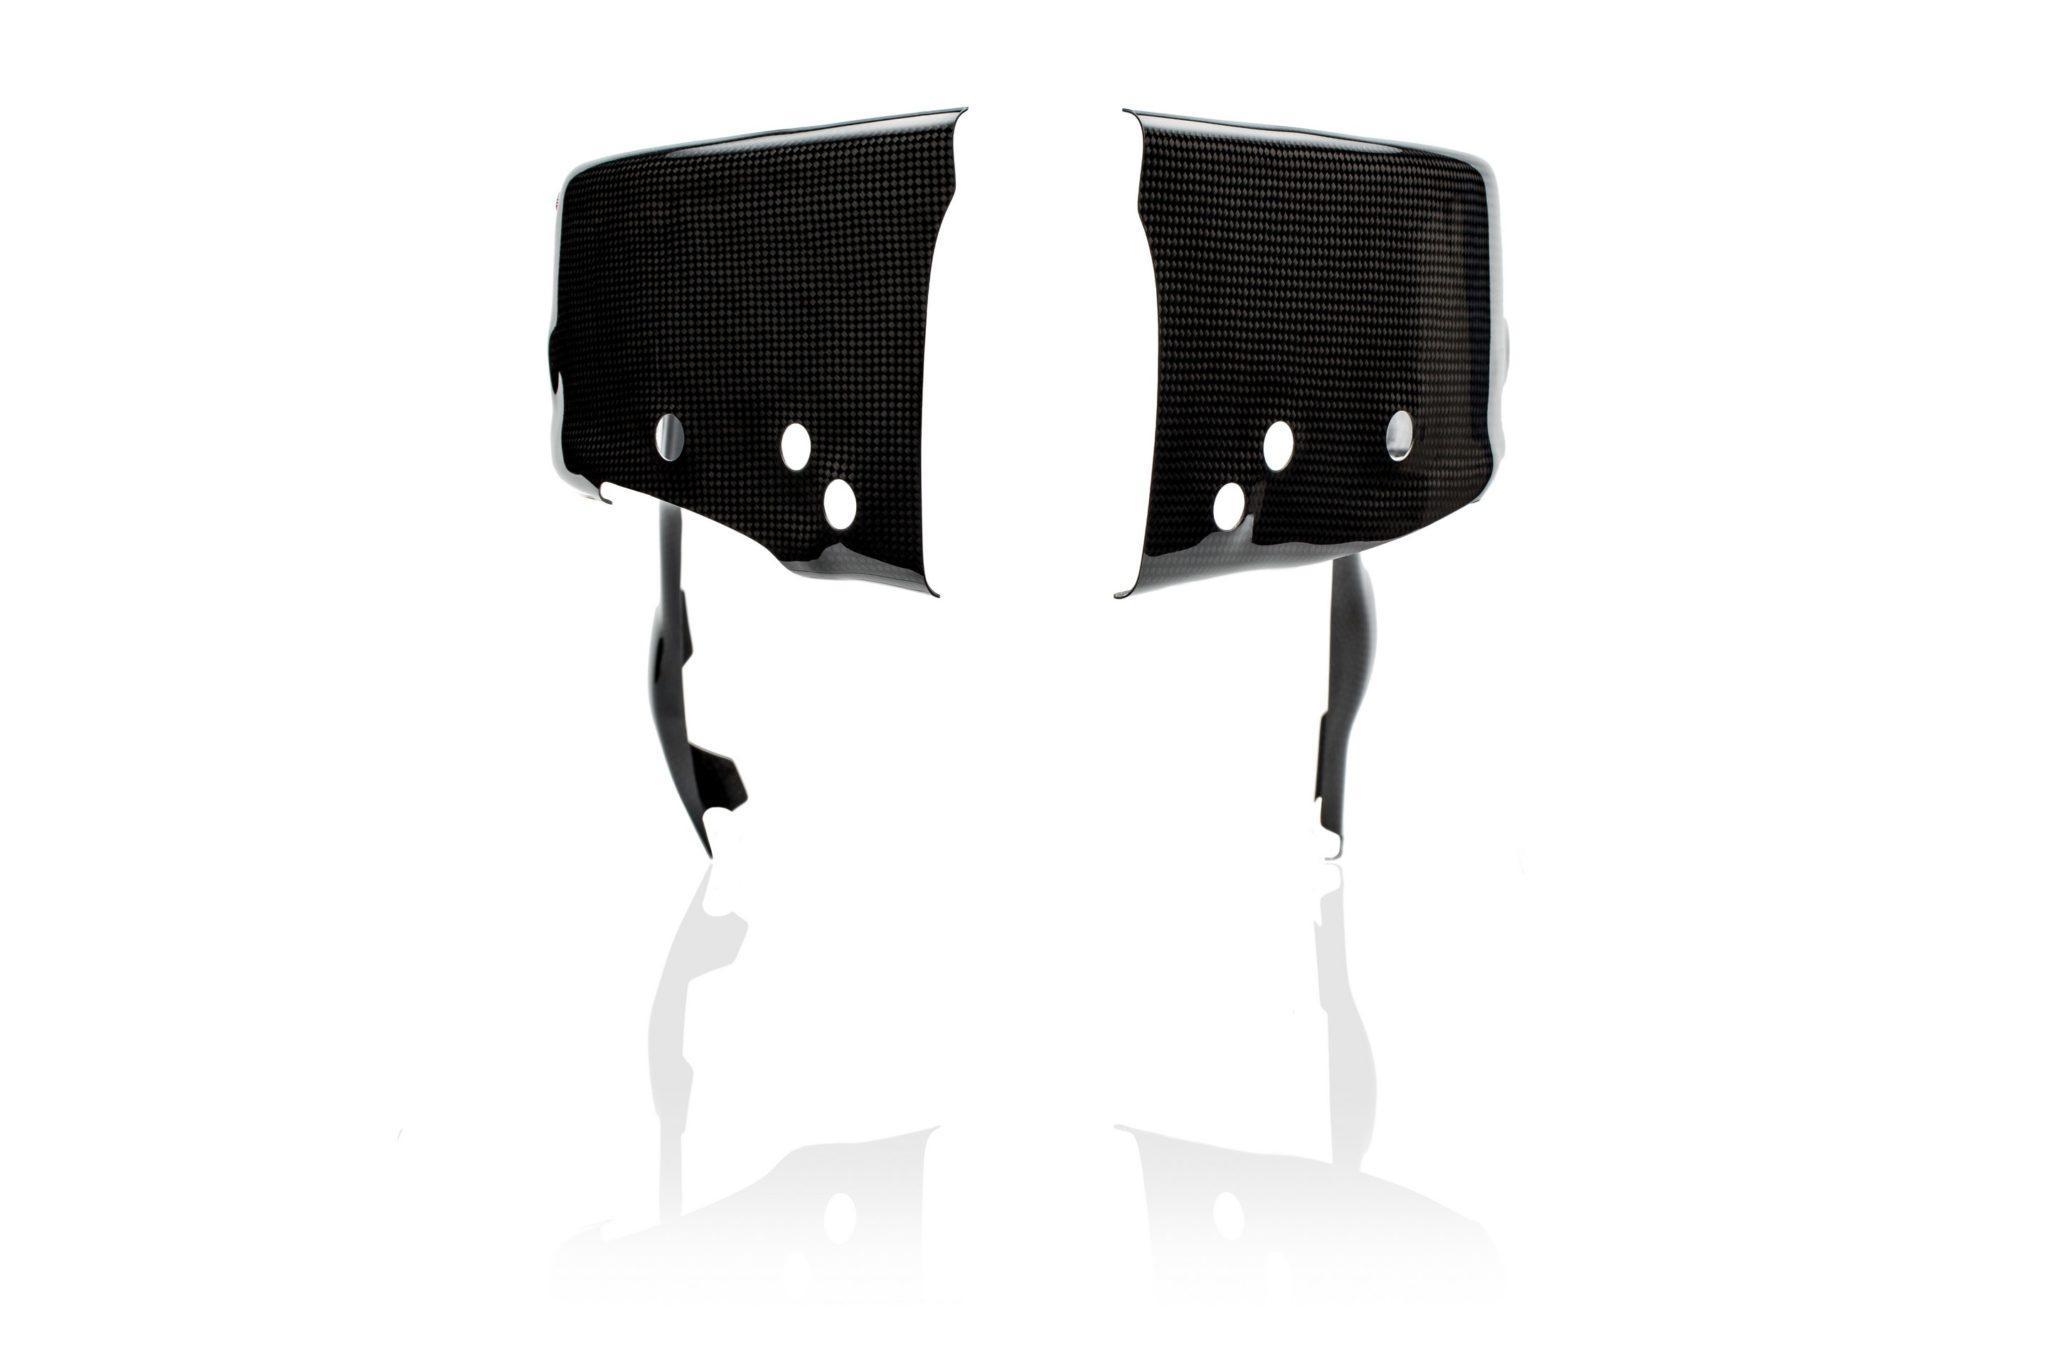 YAMAHA YZF-R6 2017-2018 Carbon Fiber Frame Covers